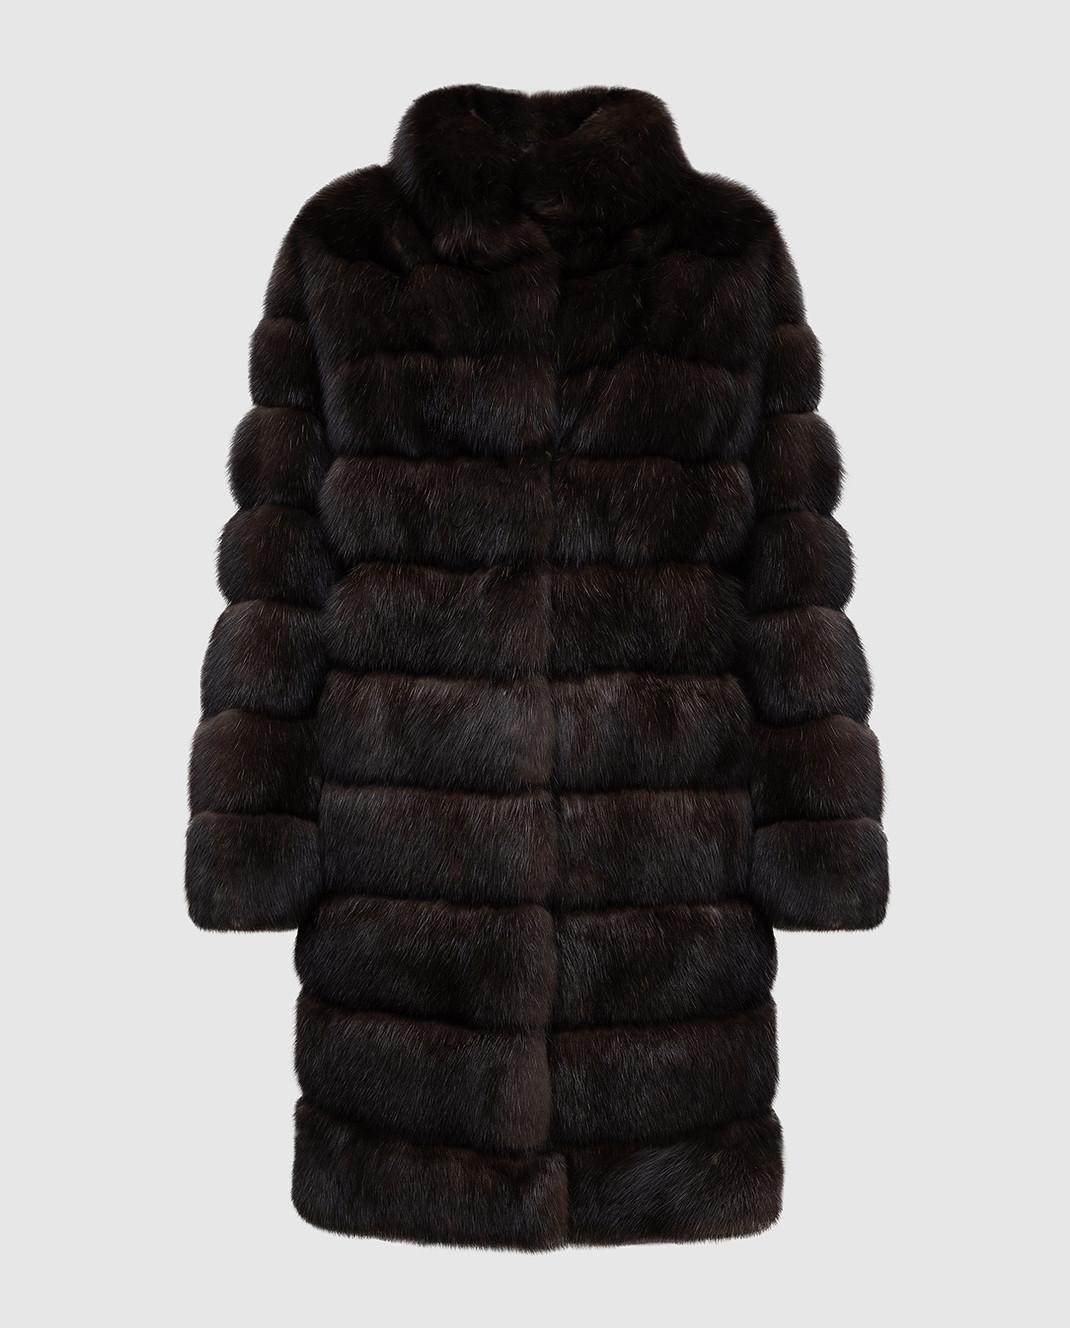 Real Furs House Темно-коричневая шуба из соболя SBR28622DARKSILV290